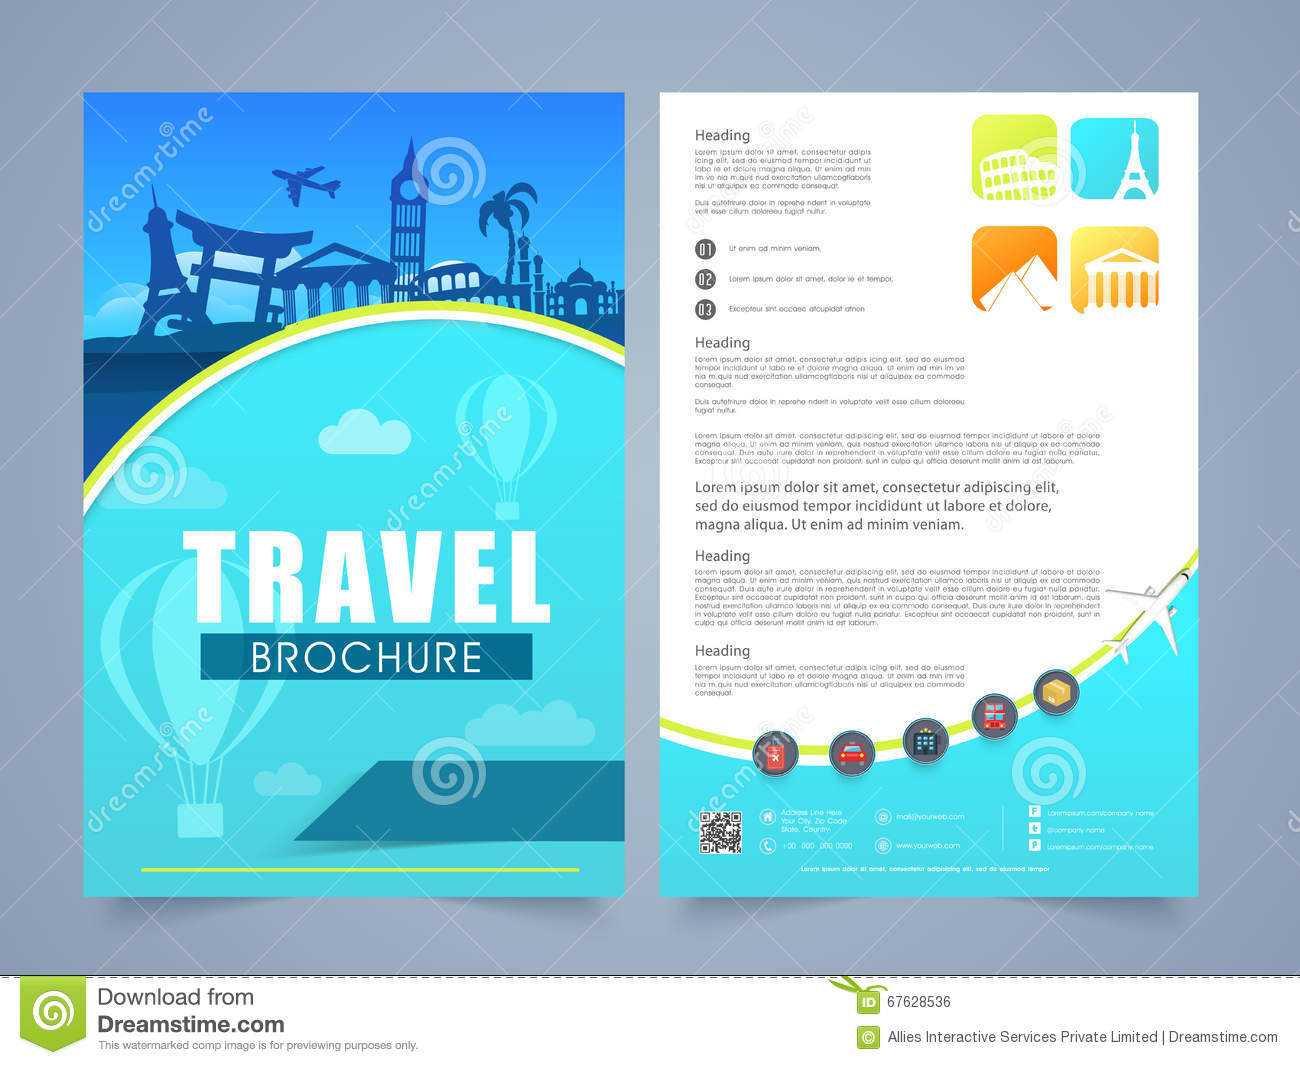 Travel Brochure, Template Or Flyer Design. Stock For Travel And Tourism Brochure Templates Free